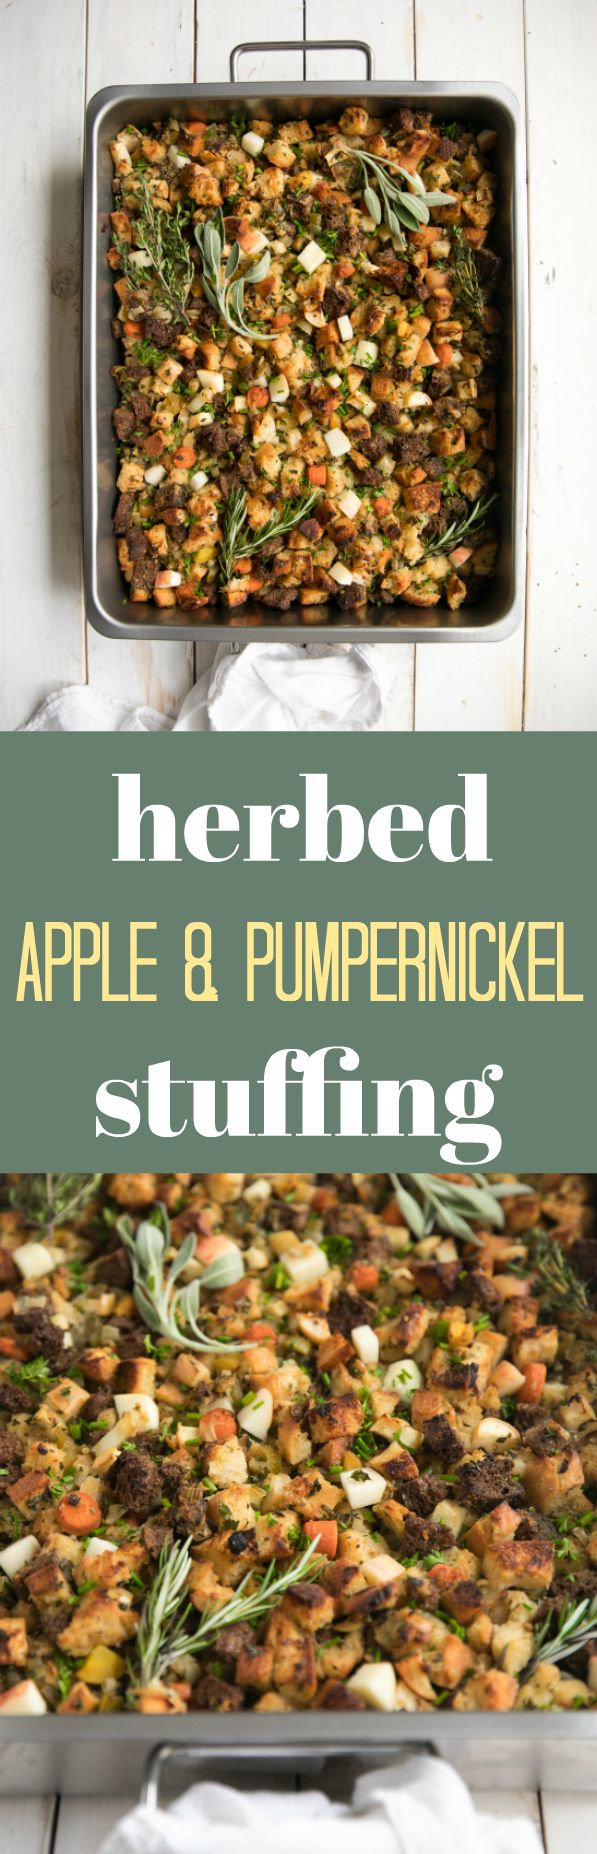 Herbed Apple and Pumpernickel Stuffing #vegetarian #thanksgiving #healthy #sidedish #recipe #holiday #pumpernickel #sourdough